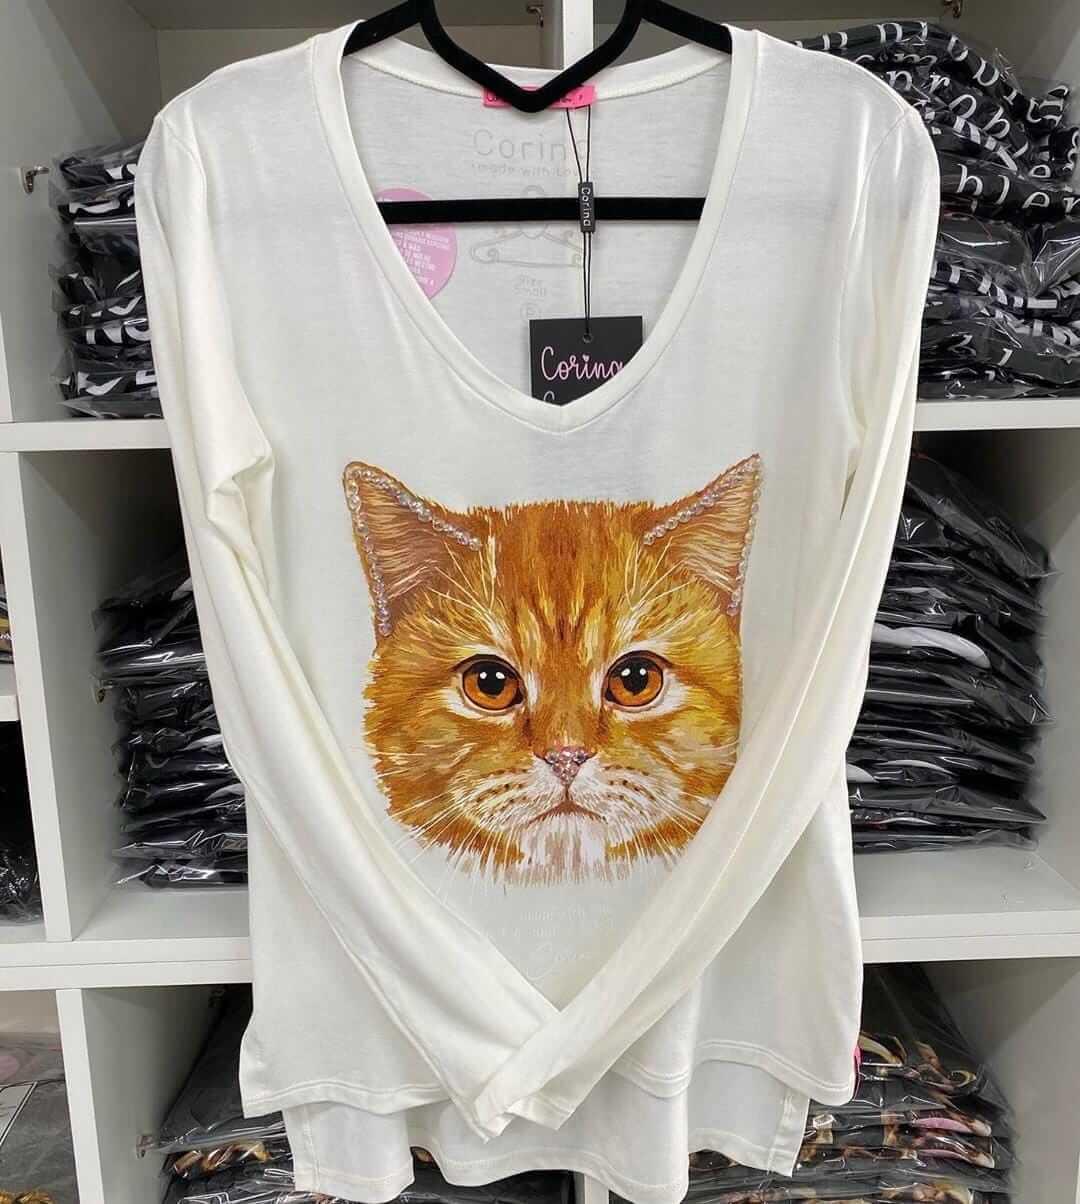 Corina T-Shirt Manga Longa Gato - Off White - com bordado